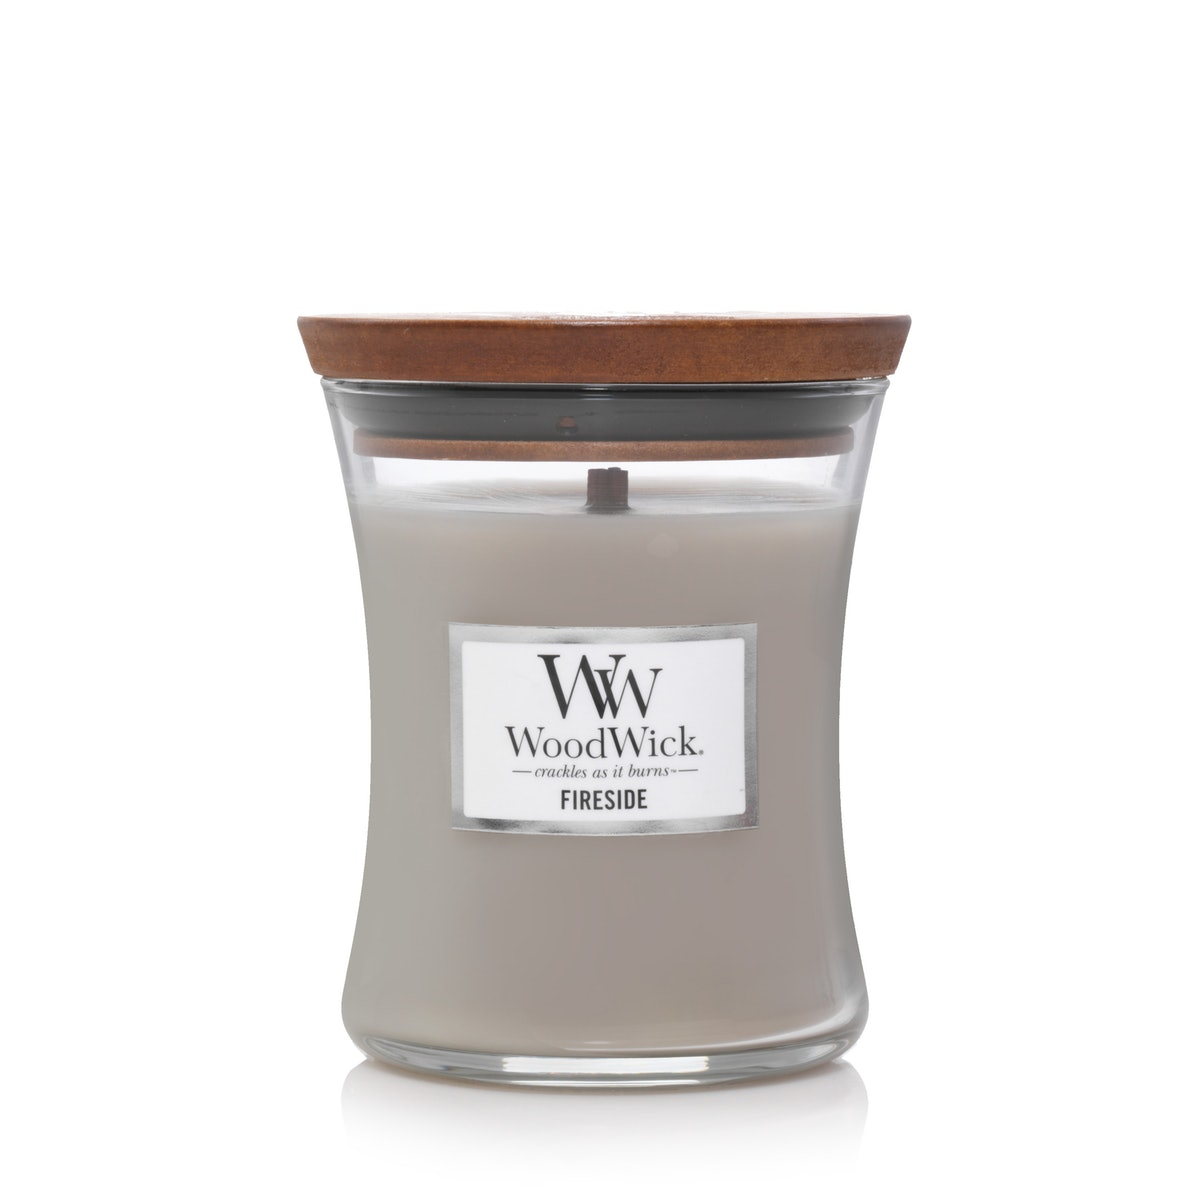 WoodWick Fireside Medium Hourglass Candle